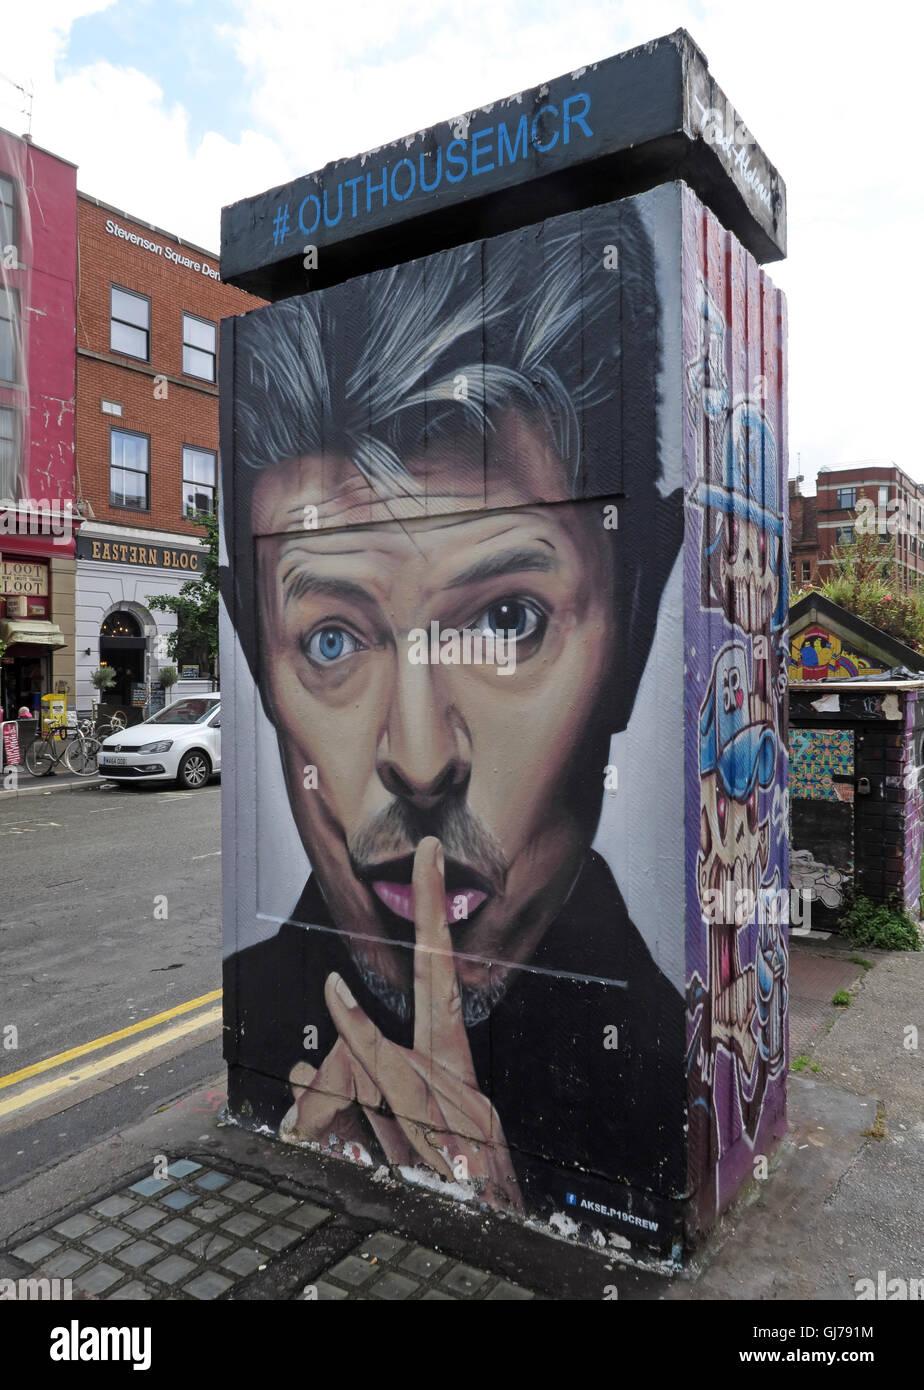 art,bowie,face,faces,David,paint,arts,media,paint,painting,Manchester,city,centre,Wall,Graffiti,August2016,August,2016,OUTHOUSEMCR,culture,historic,history,industry,industrial,tourist,tourism,travel,finger,#outhousemcr,David Bowie,Wall Graffiti,Northern Quarter,Stevenson,Square,GoTonySmith,@HotpixUK,HotpixUK,United,Kingdom,GB,English,British,shh,city,centre,Buy Images Of,Images of,Stock Images,United Kingdom,Great Britain